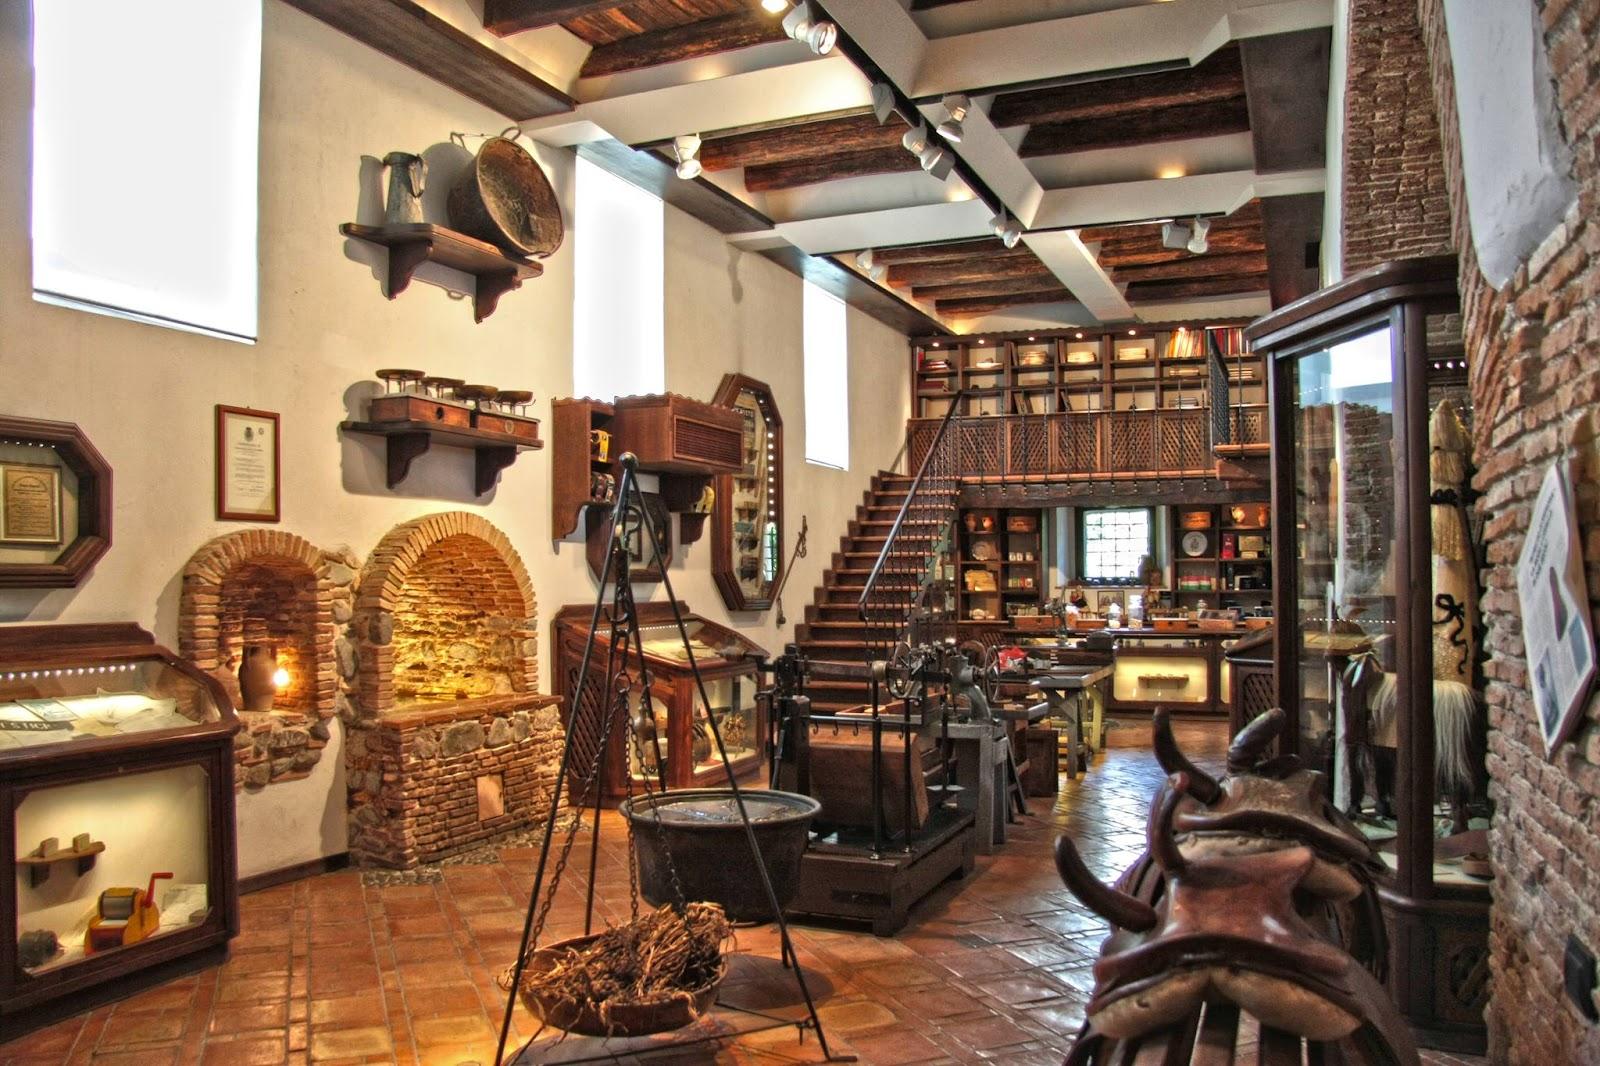 Museo d'impresa liquirizia Amarelli